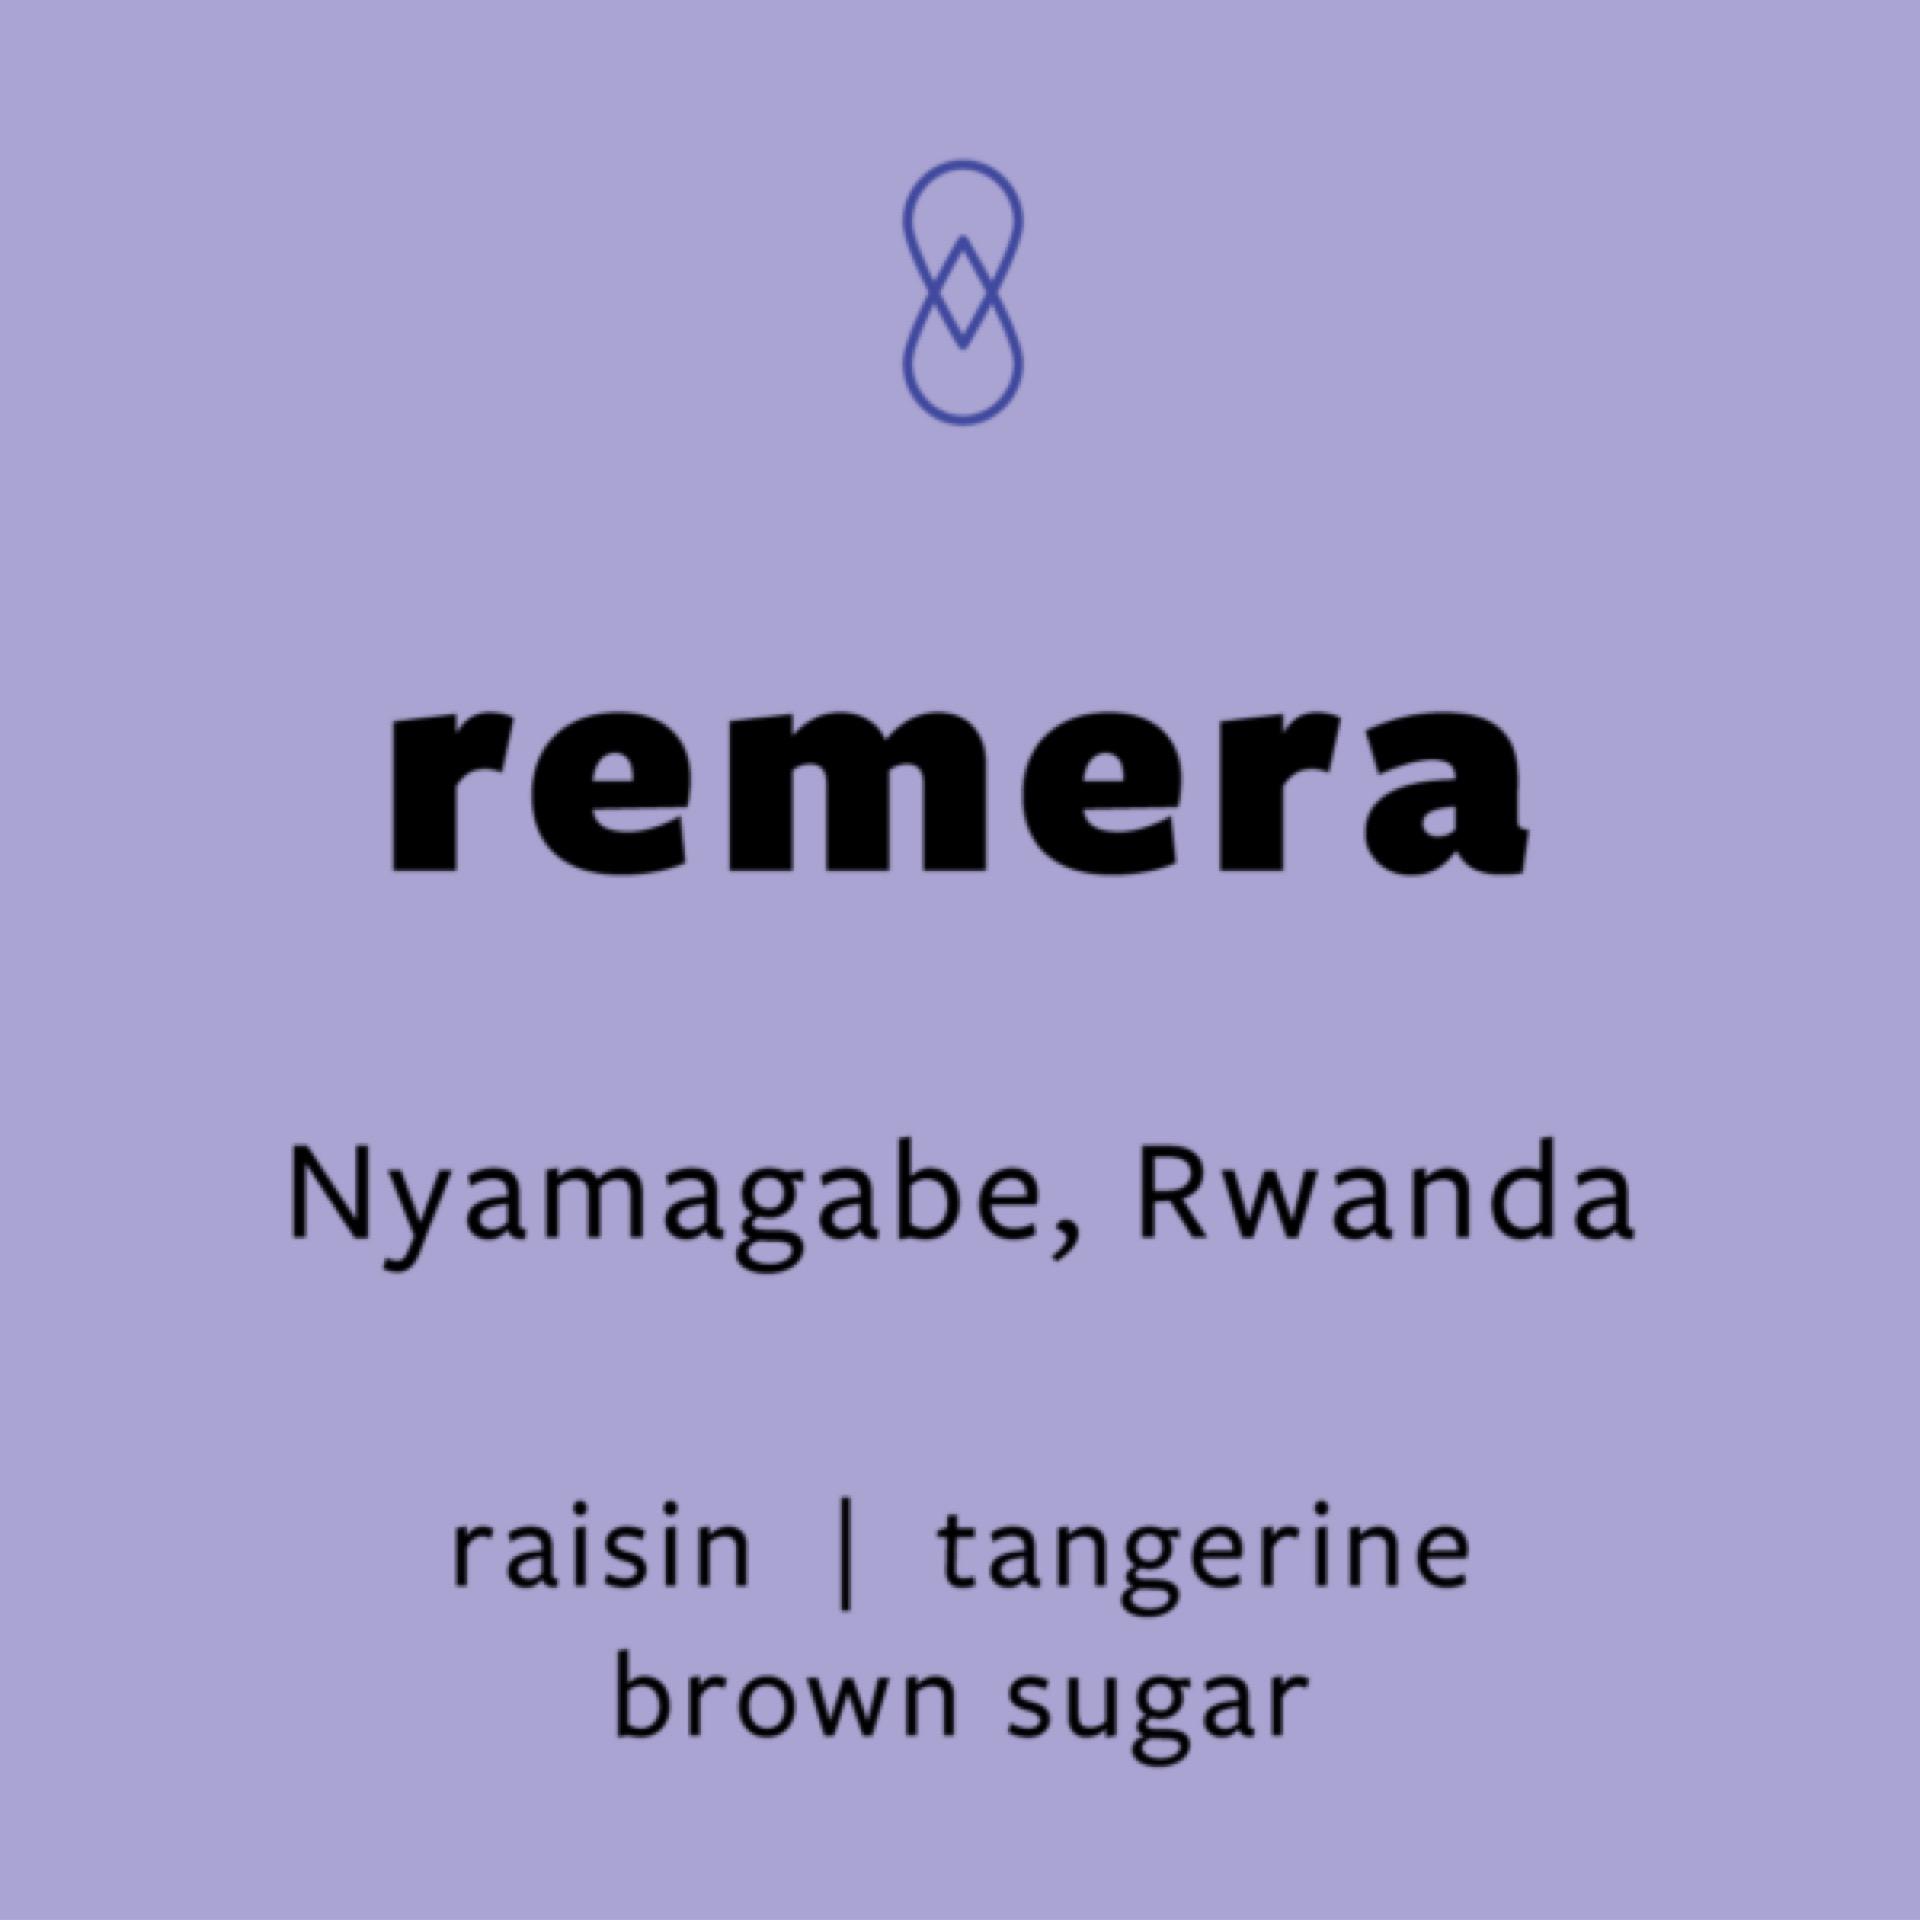 Remera (Nyamagabe, Rwanda)